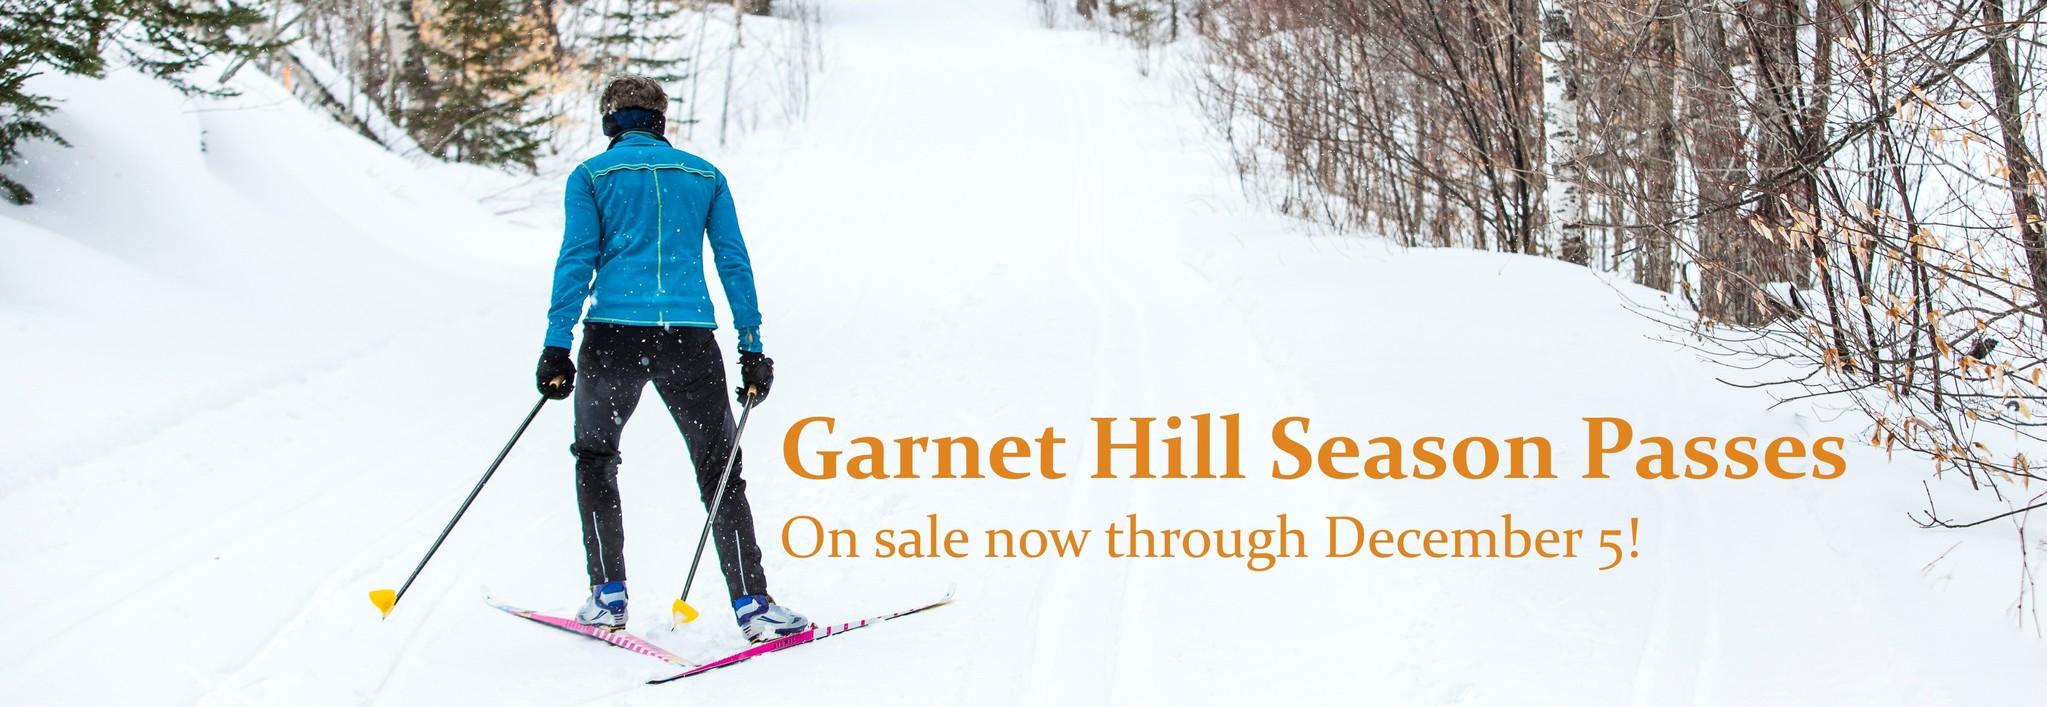 Season Passes on Sale Through Dec 5